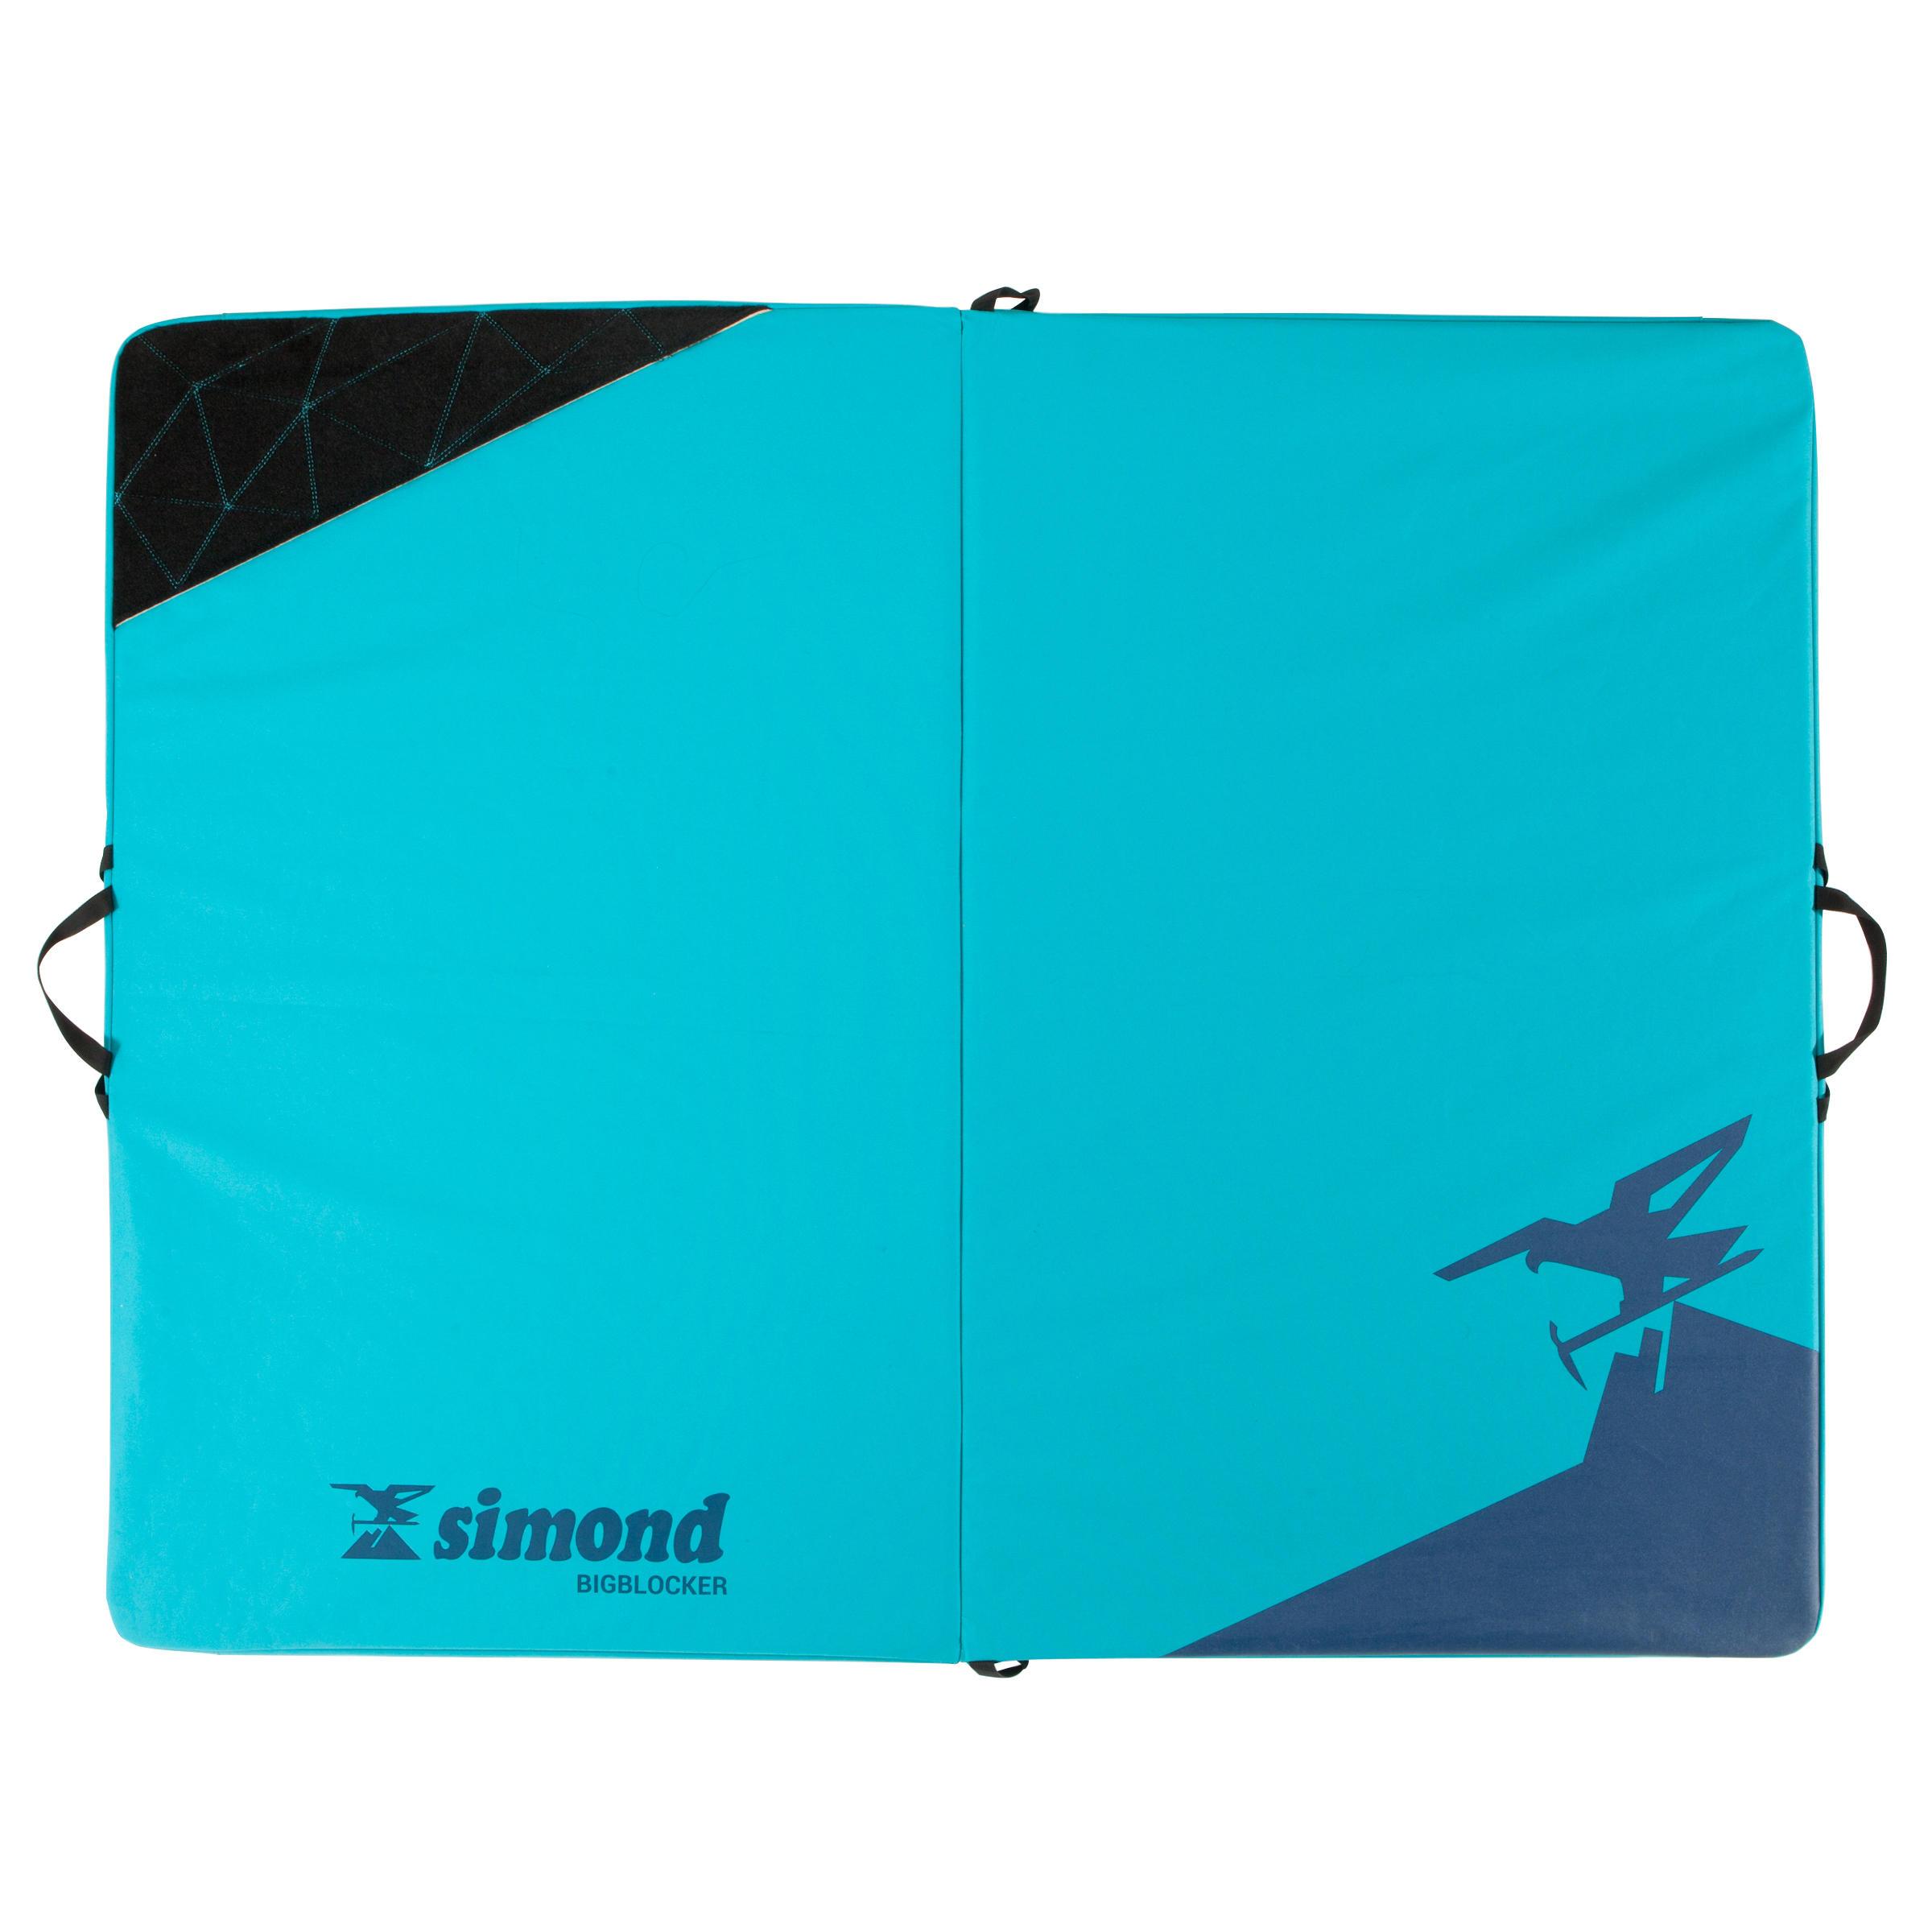 Simond Crash pad Bigblocker